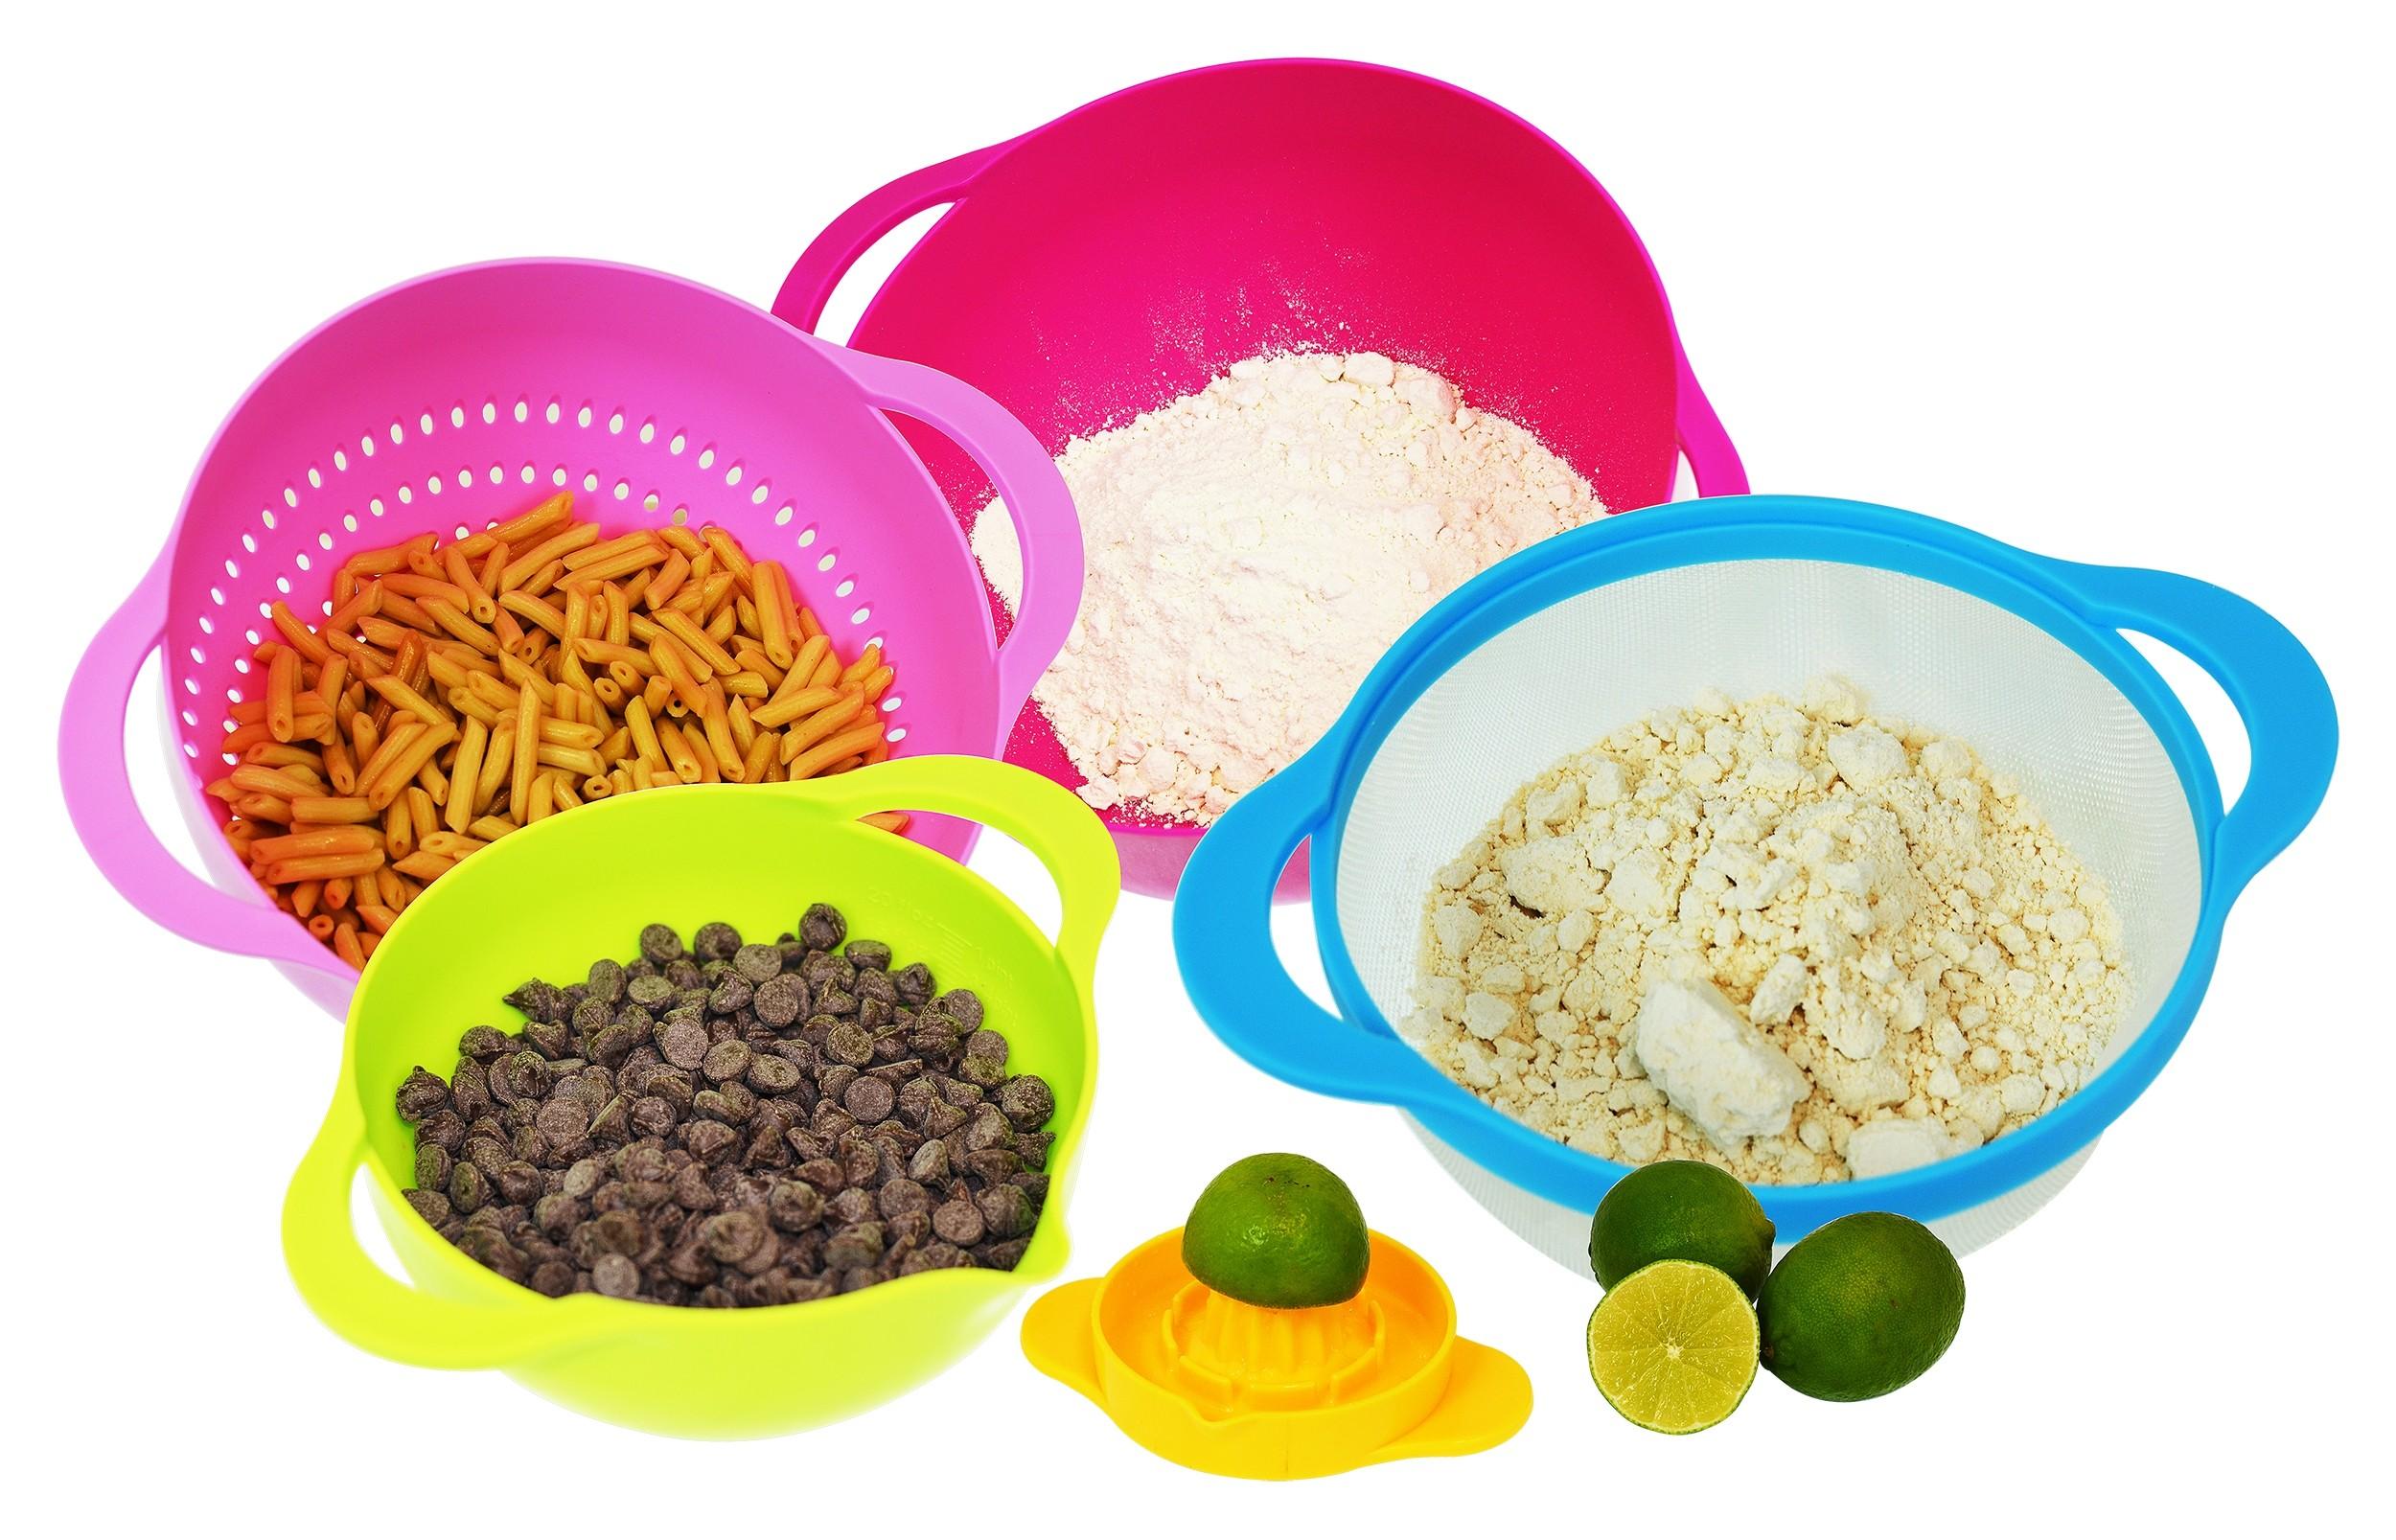 5 Piece Nesting Bowl Cooking Set